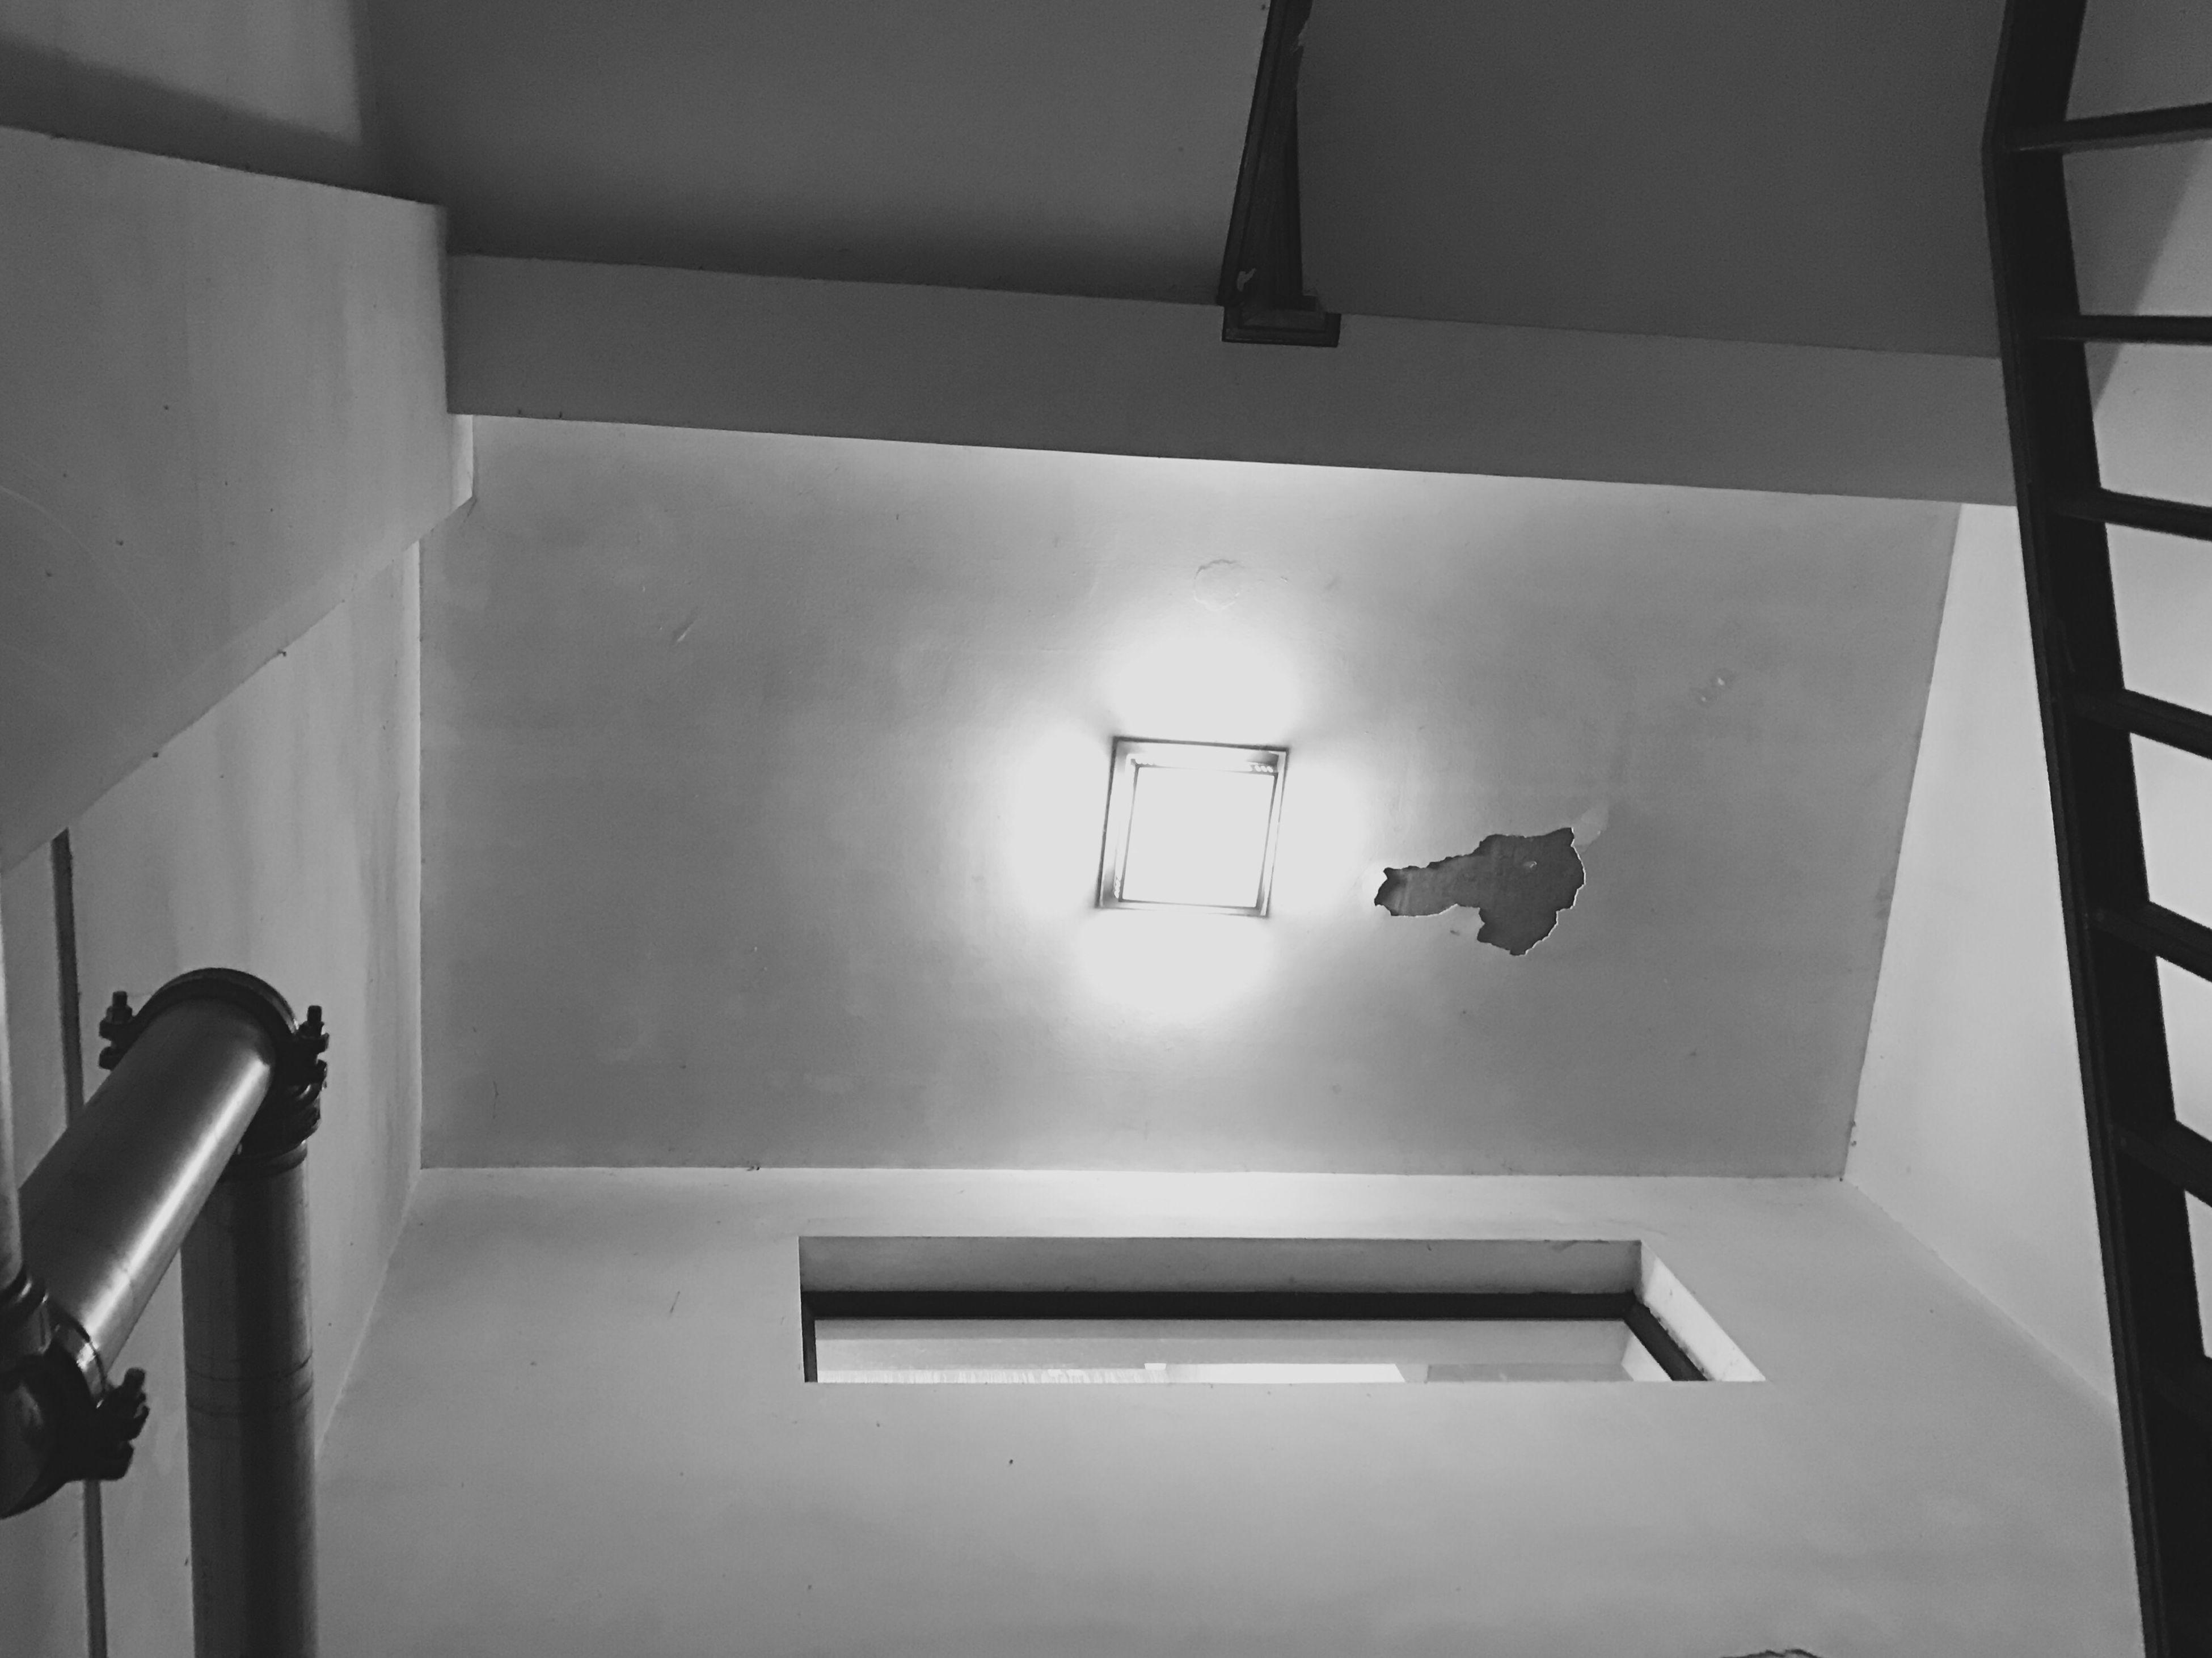 indoors, lighting equipment, illuminated, no people, domestic room, home interior, bathroom, architecture, day